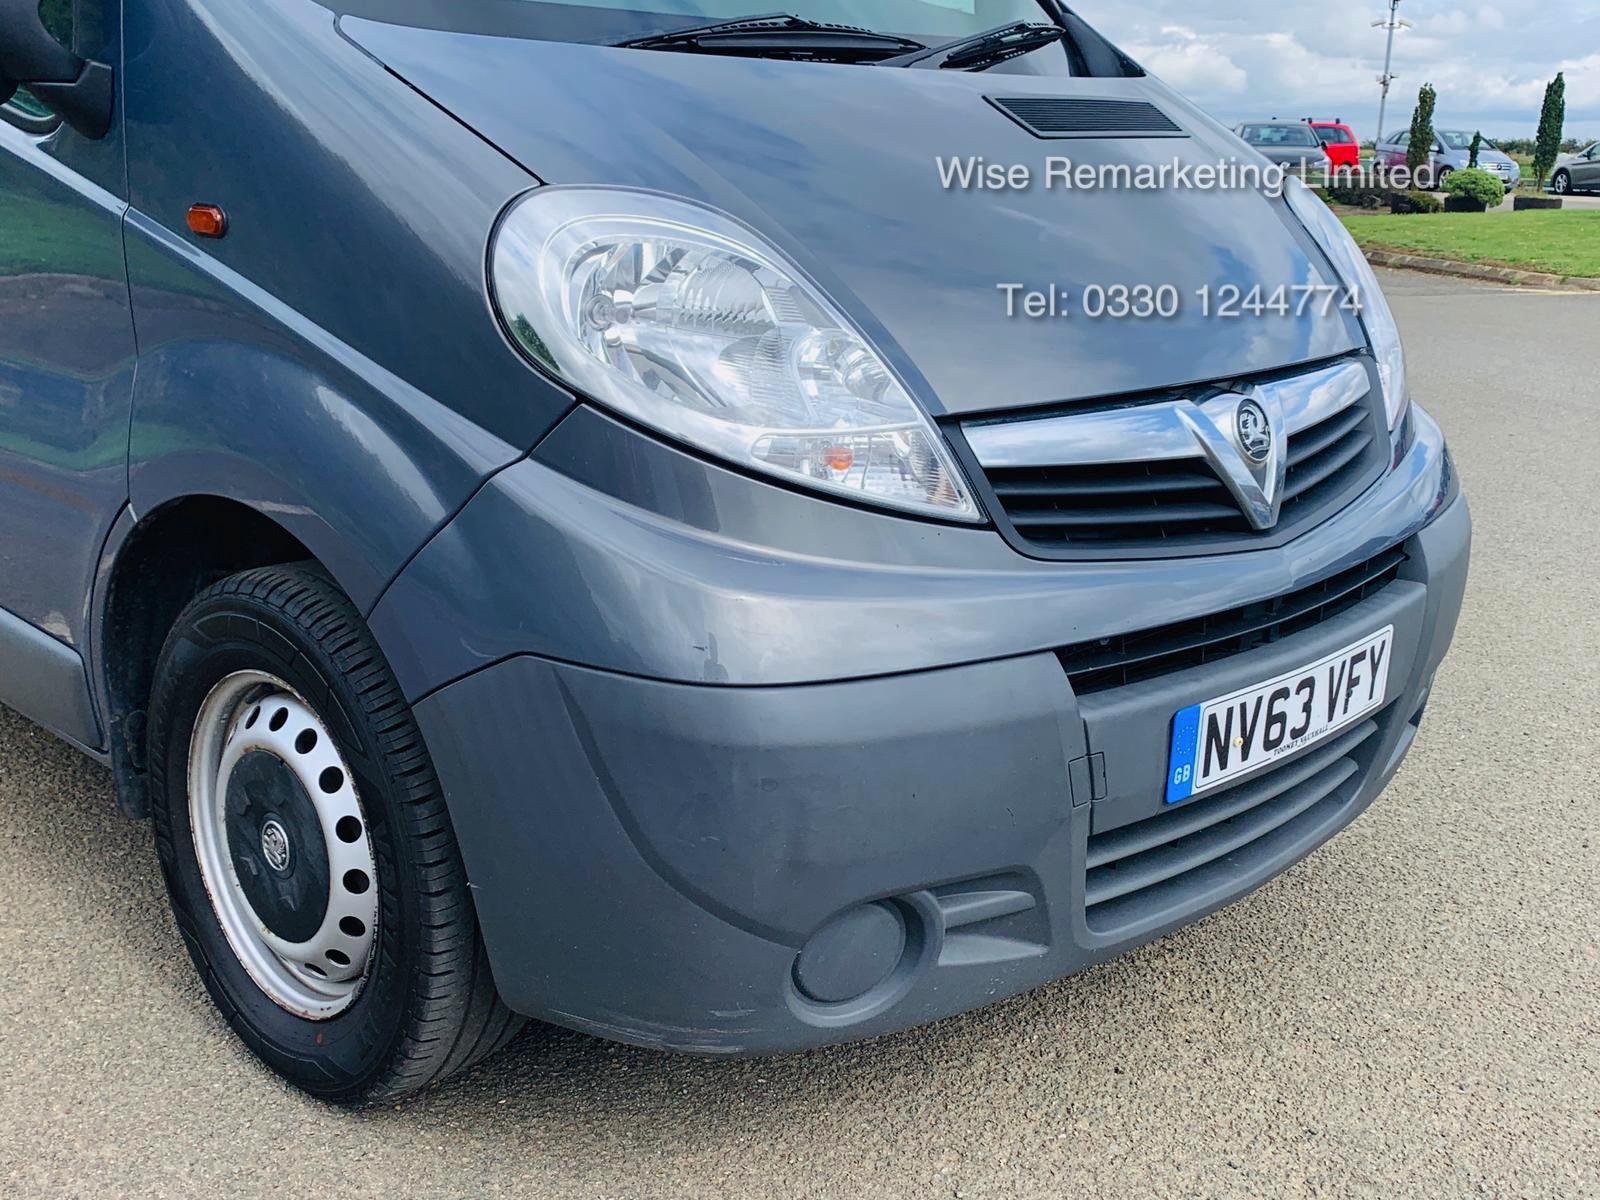 Lot 8 - Vauxhall Vivaro 2.0 CDTI 2900 Minibus - 2014 Model - Wheel Chair Access -1 Owner From New -History